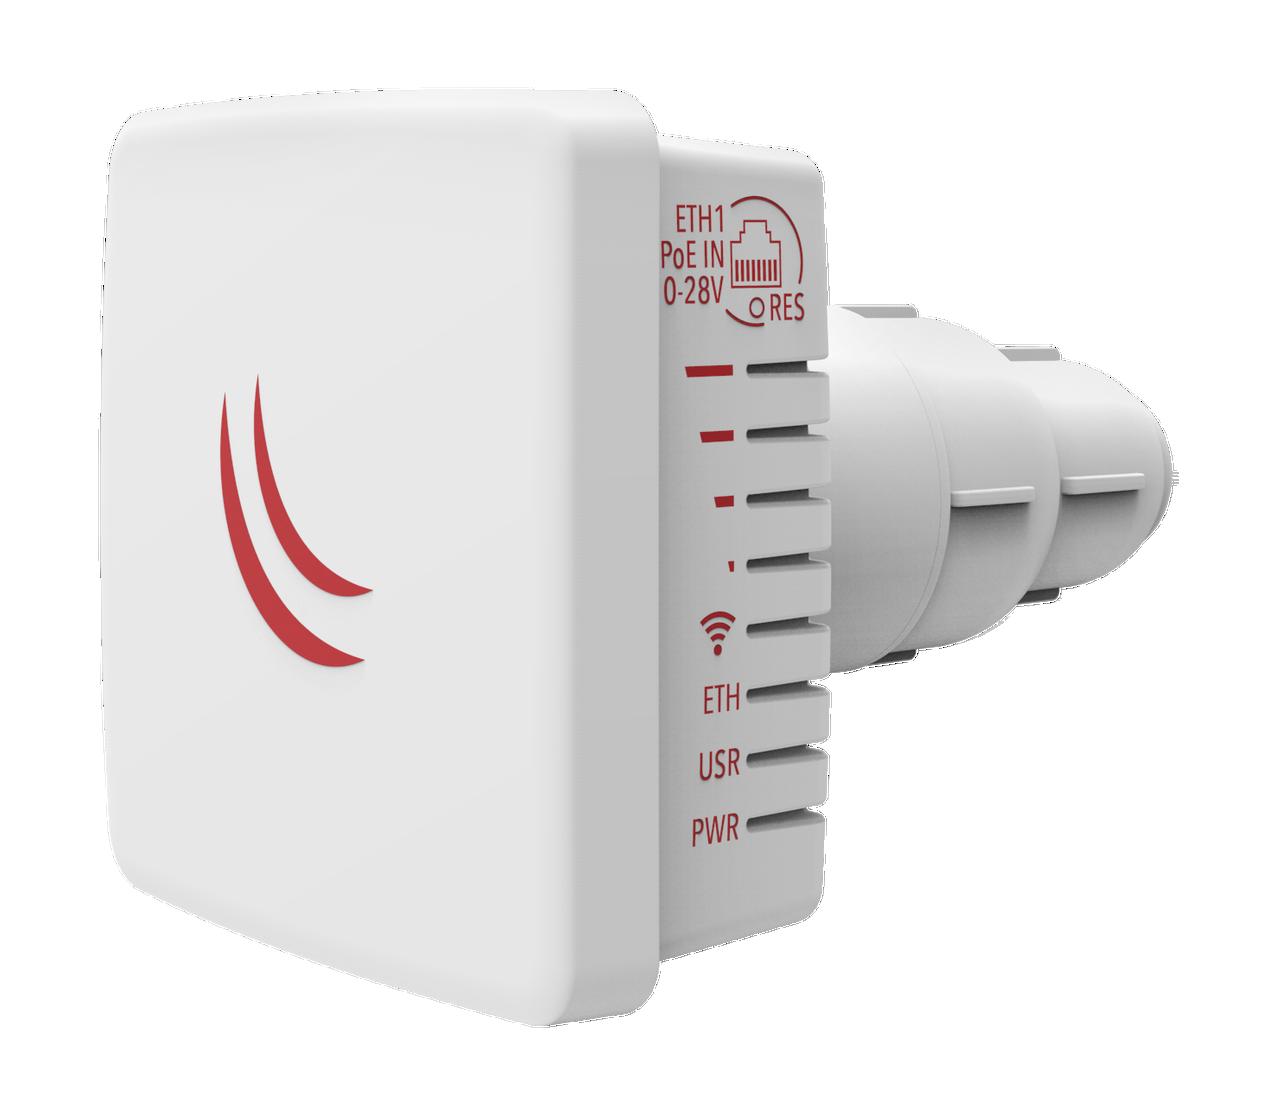 Mikrotik RBLDF-5nD Lite Dish Feed LDF 5 Outdoor Wireless